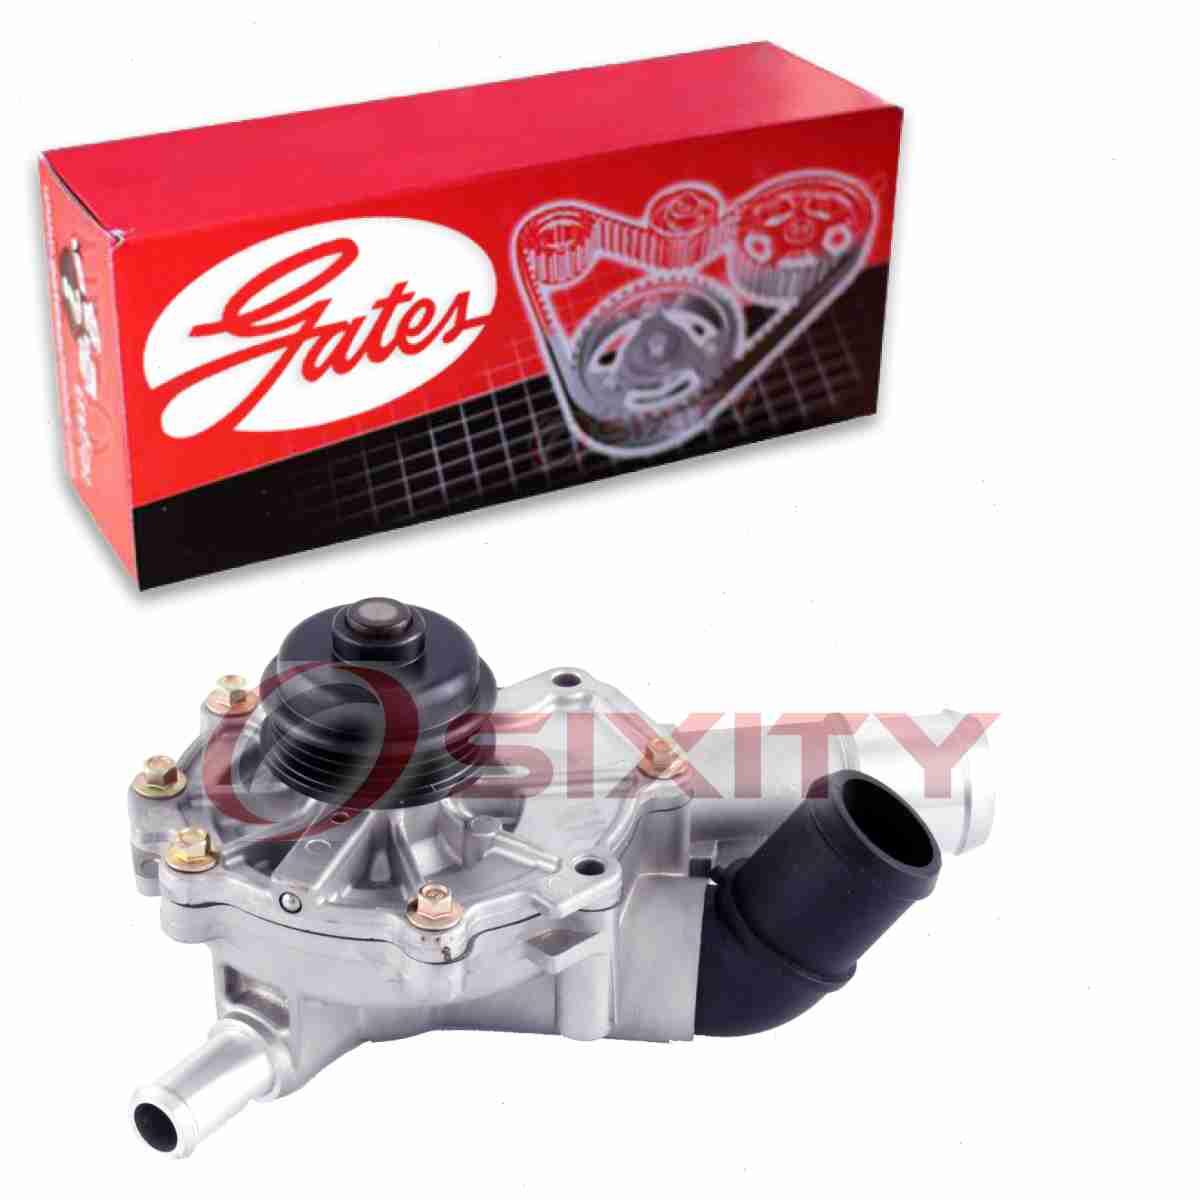 Coolant ro Gates Engine Water Pump for 2003-2008 Mazda Tribute 3.0L V6